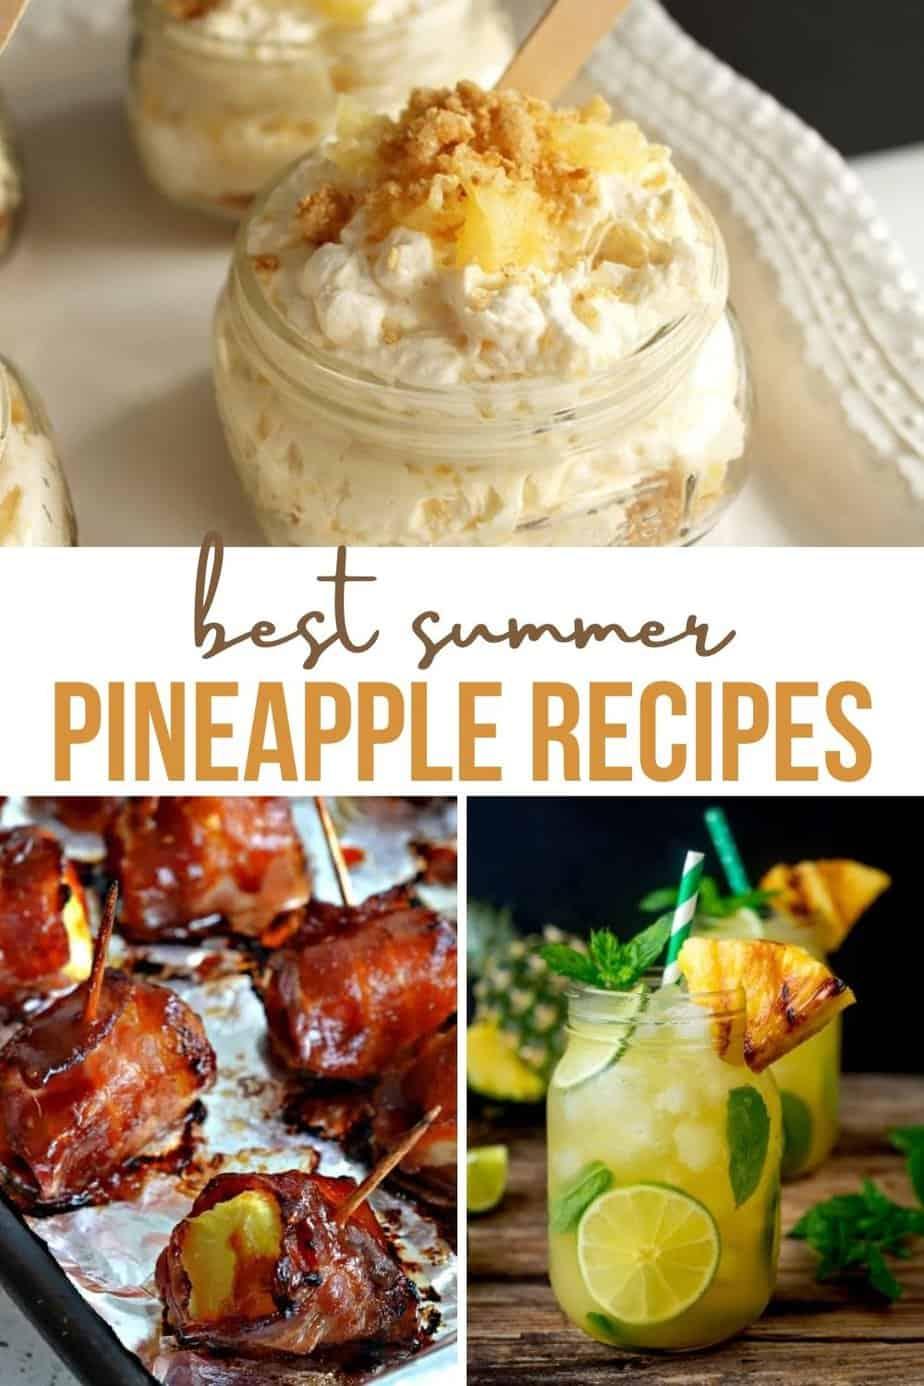 Best Summer Pineapple Recipes